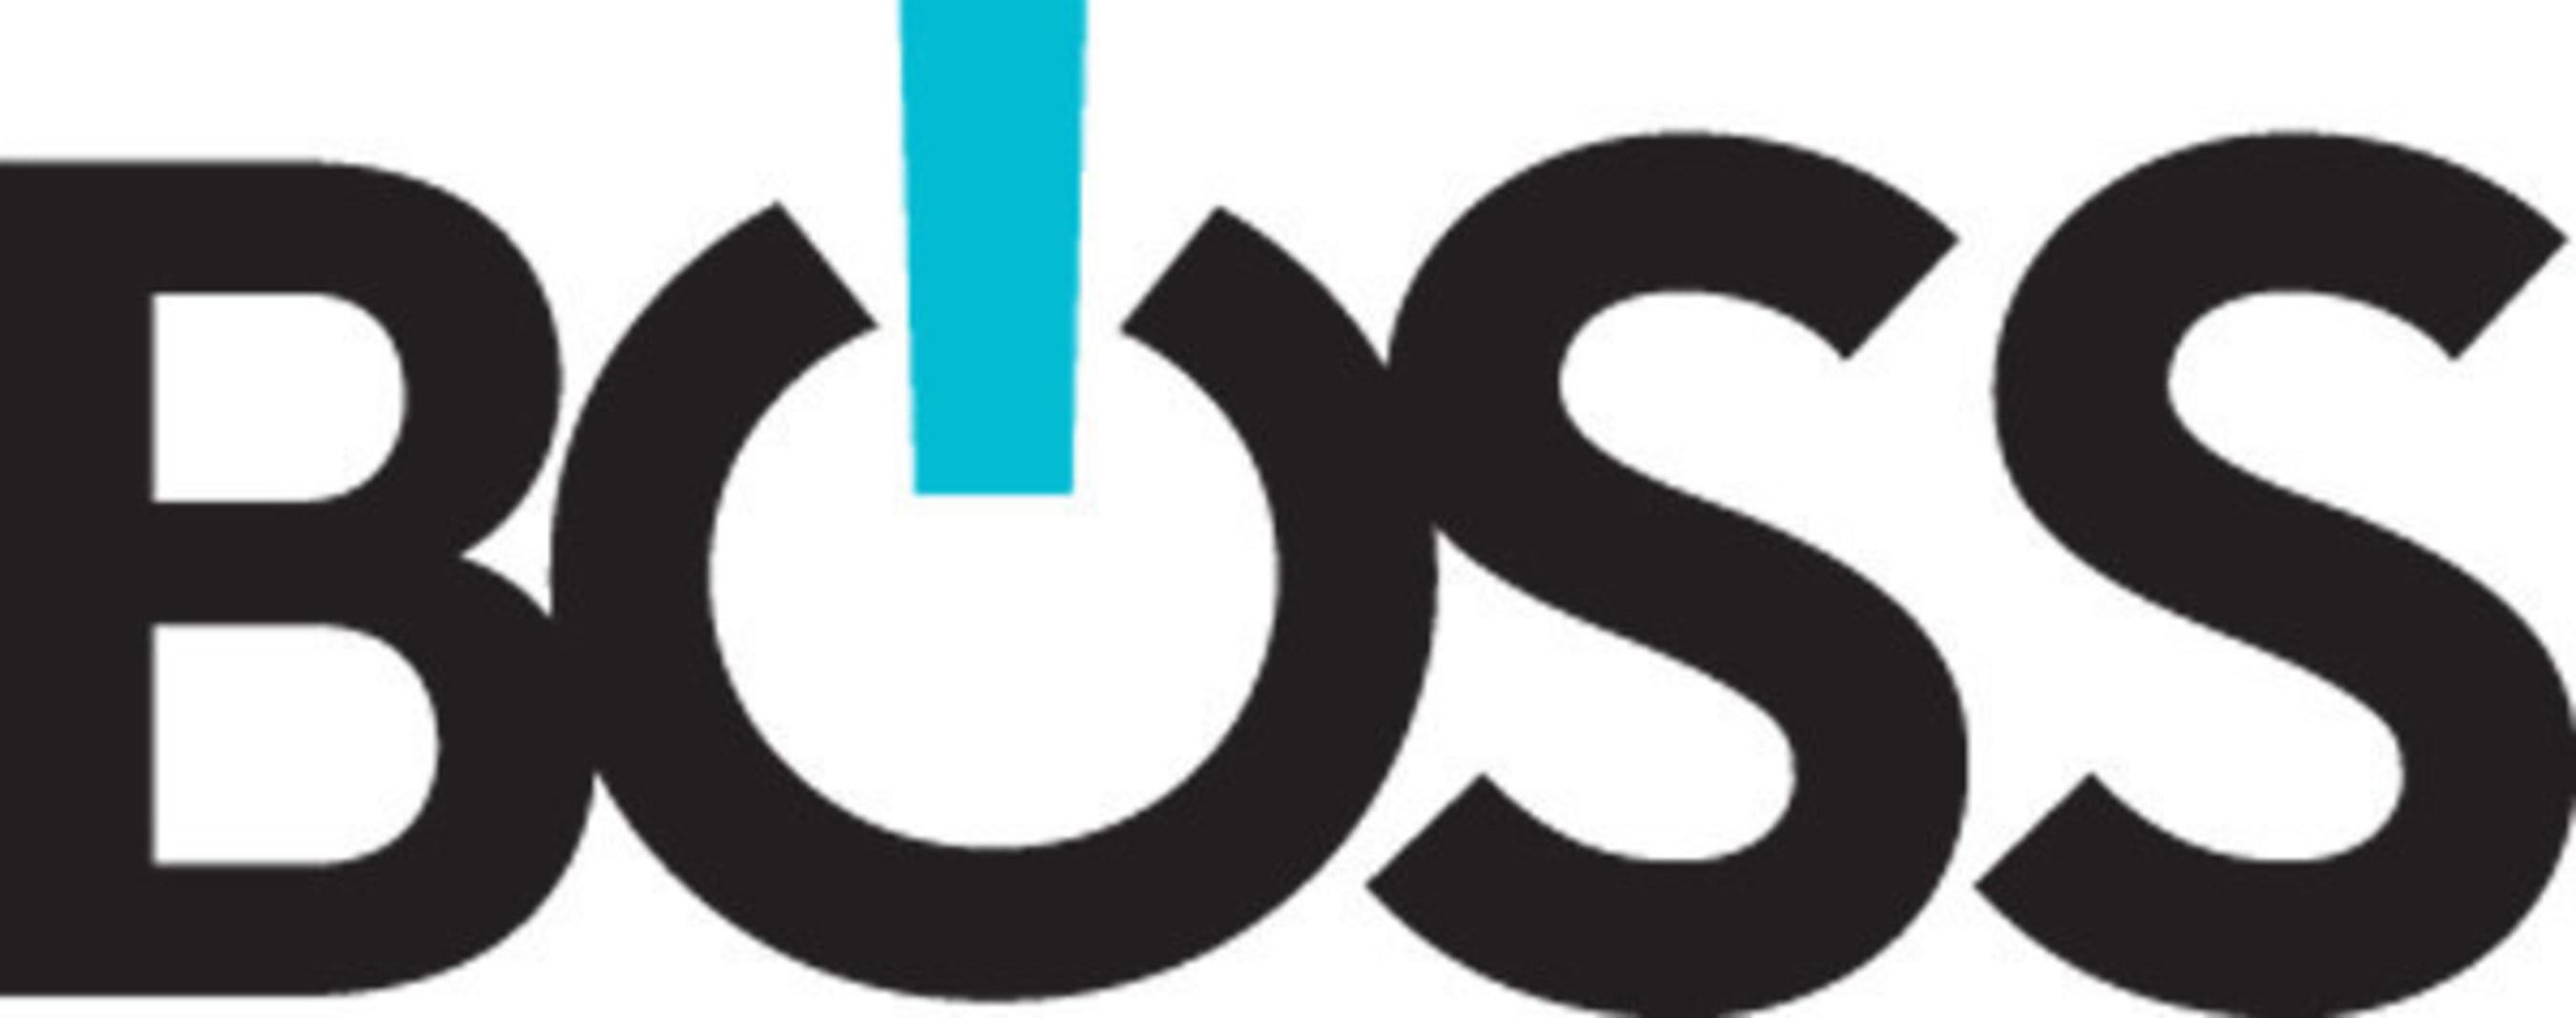 BOSS CONTROLS (PRNewsFoto/BOSS Controls)